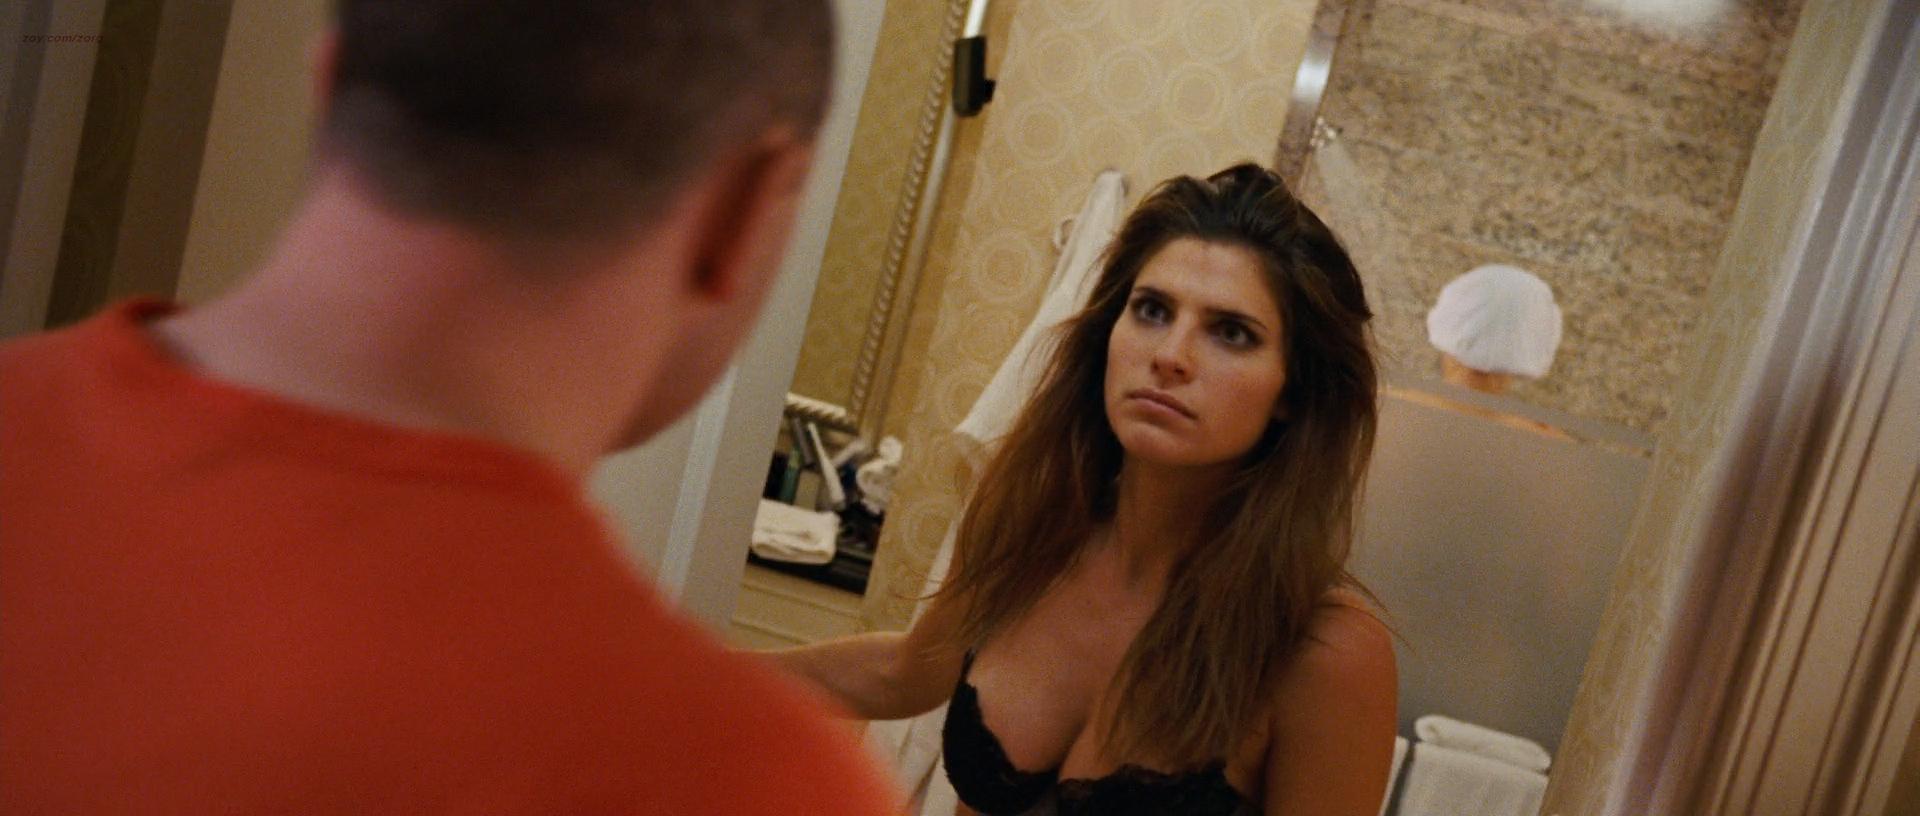 Cameron Diaz hot Krysten Ritter lingerie and Lake Bell hot in undies - What Happens In Vegas (2008) hd1080p (10)